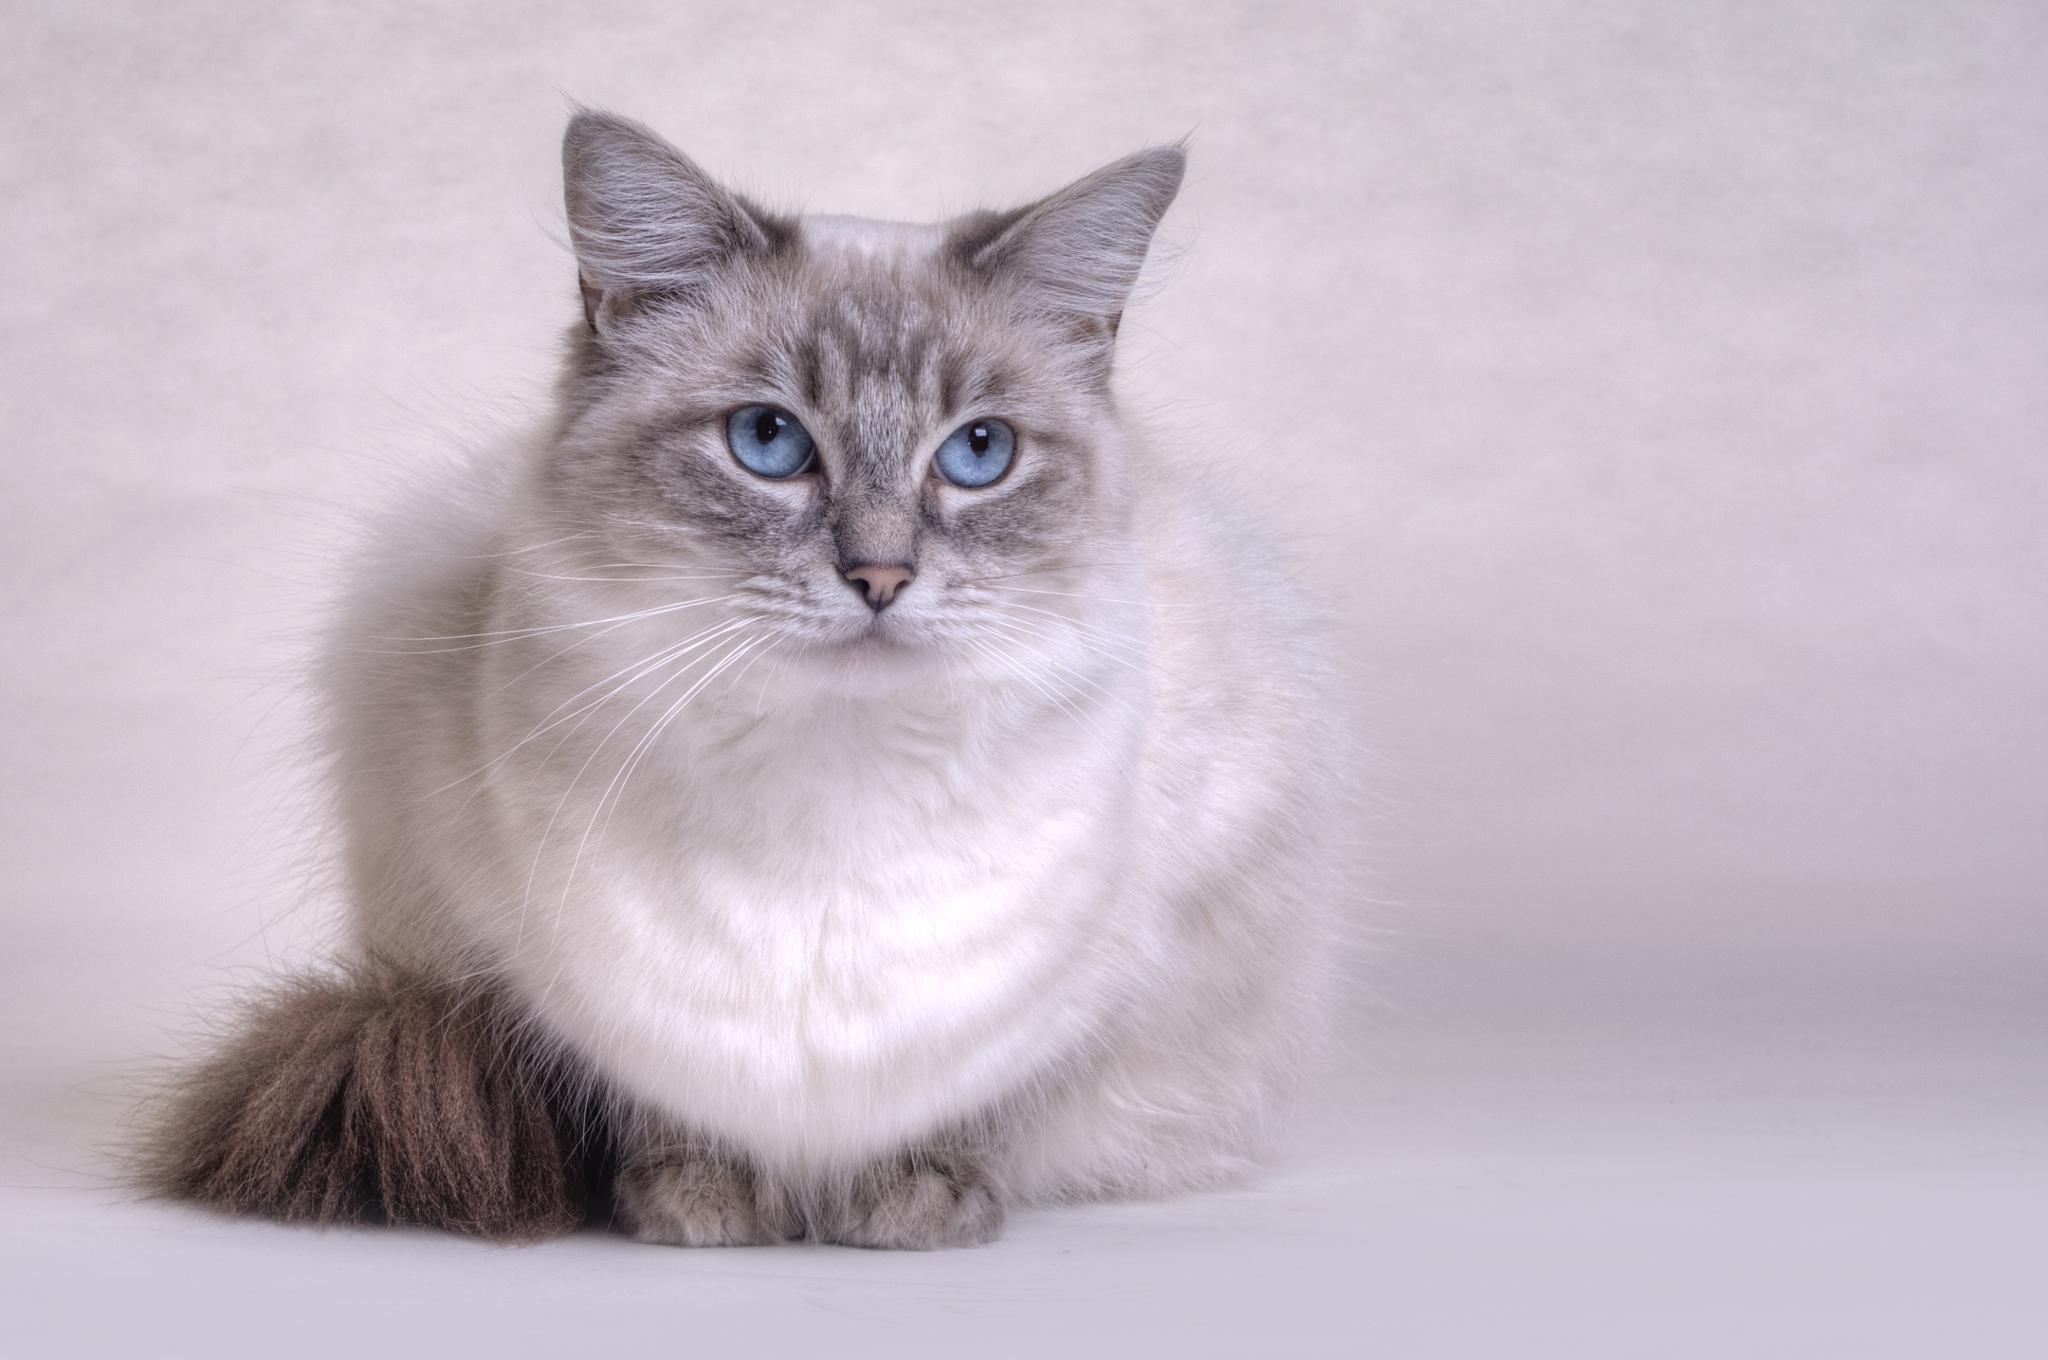 Ragdoll kitty by Cath Hardwick